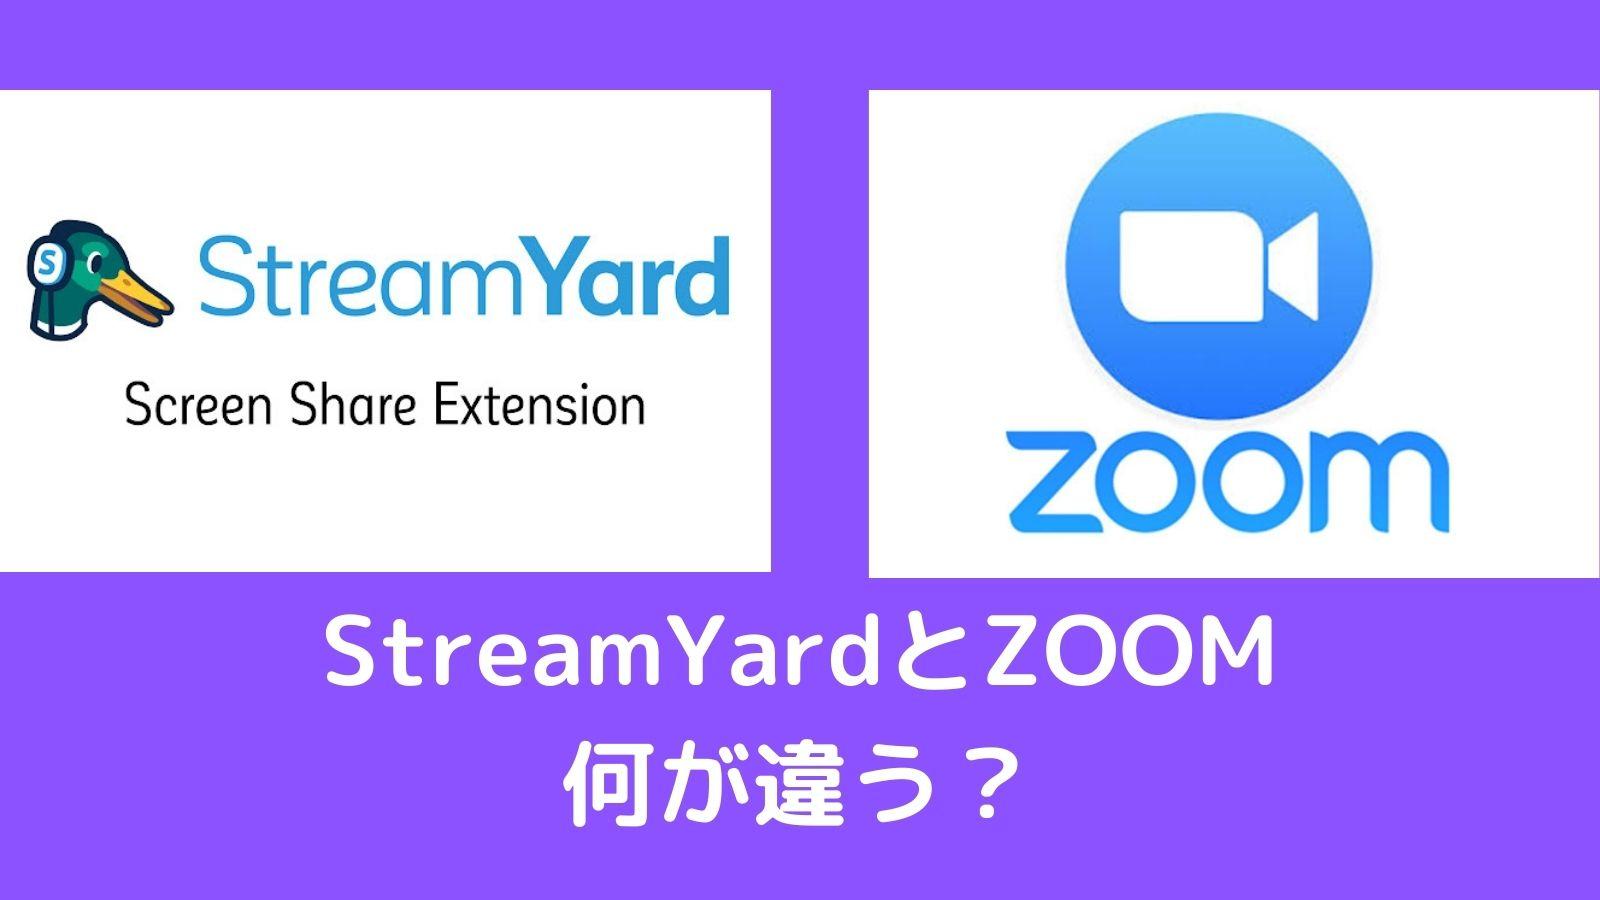 Streamyardでできること | Zoomとは何が違うのか?